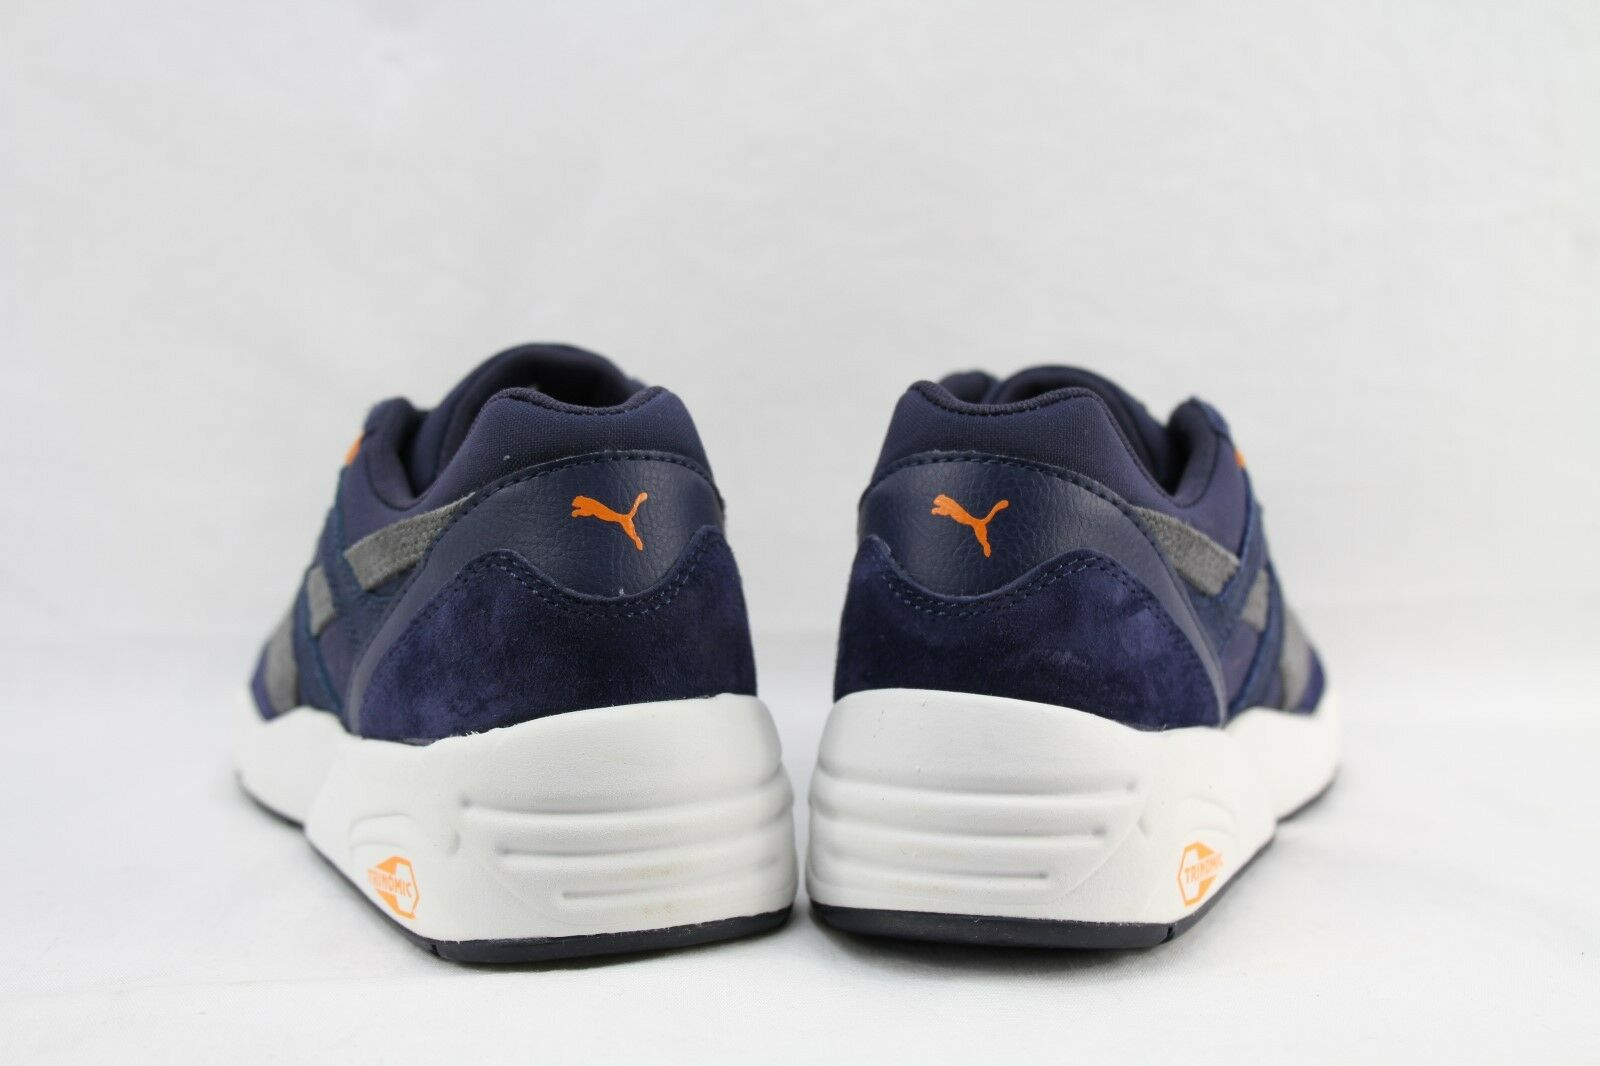 Puma Men's Shoes R698 Street Street Street 358016-02 ( Casual Sneakers ) Men's Sizes: 7.5 - 10 10c07a